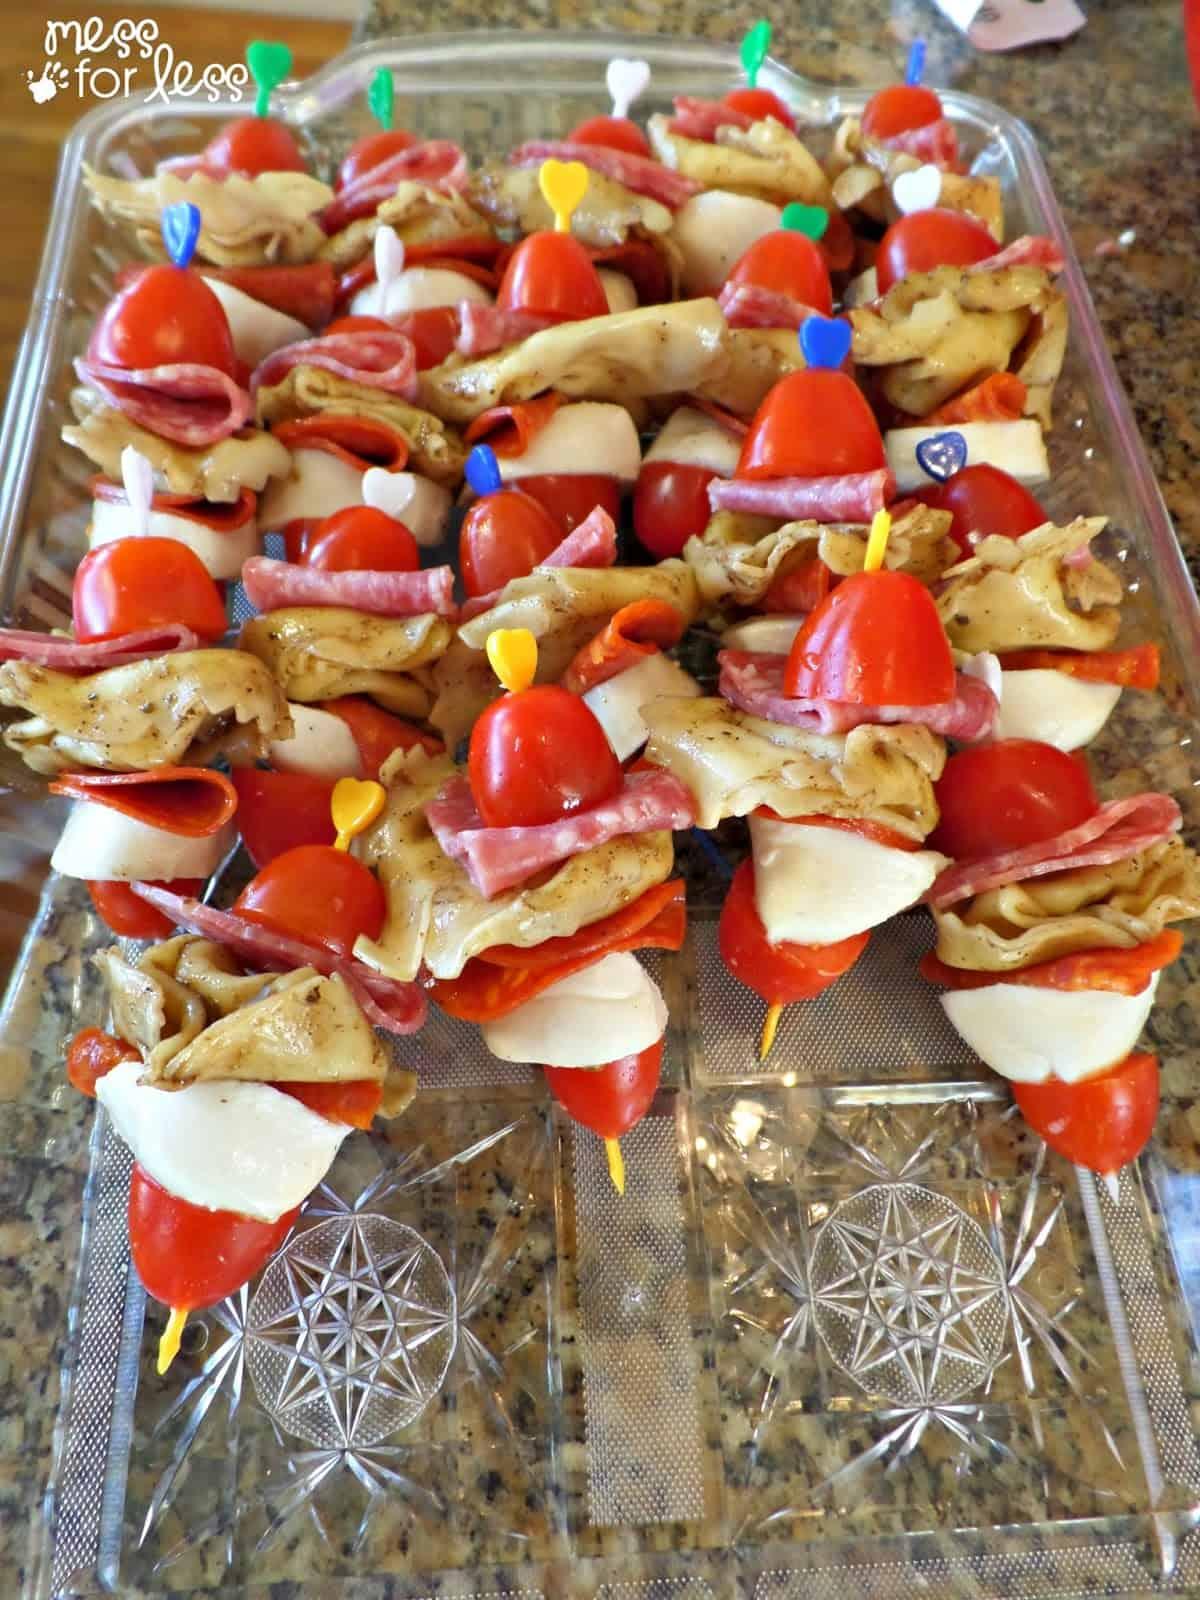 Italian Appetizers - Tortellini Salad Skewers - Mess for Less   1200 x 1600 jpeg 418kB